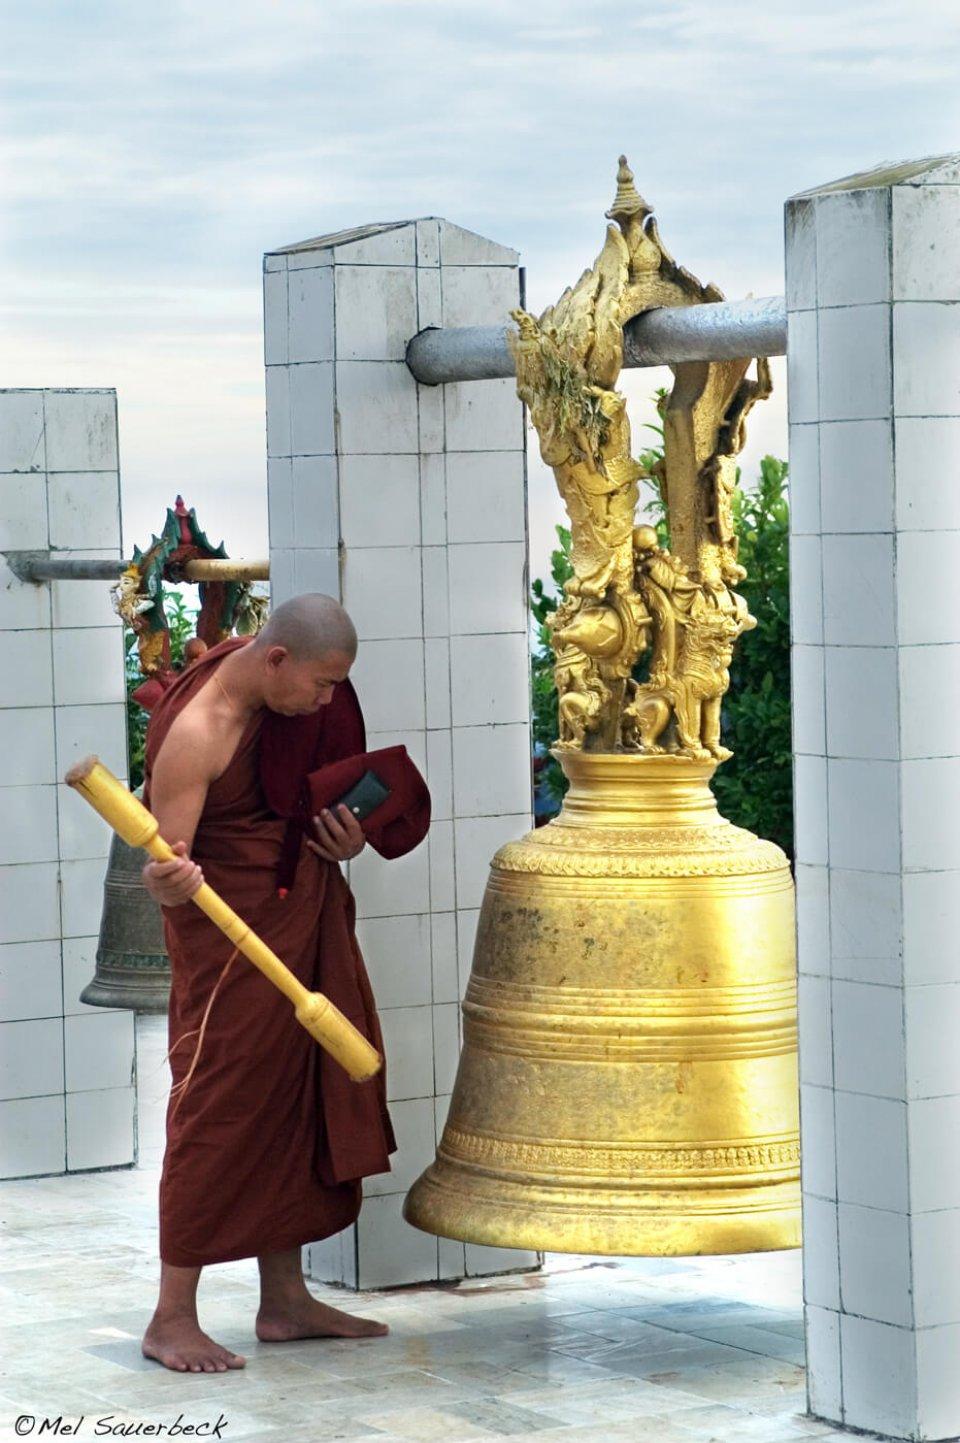 Monk ringing bell, Myanmar, Burma